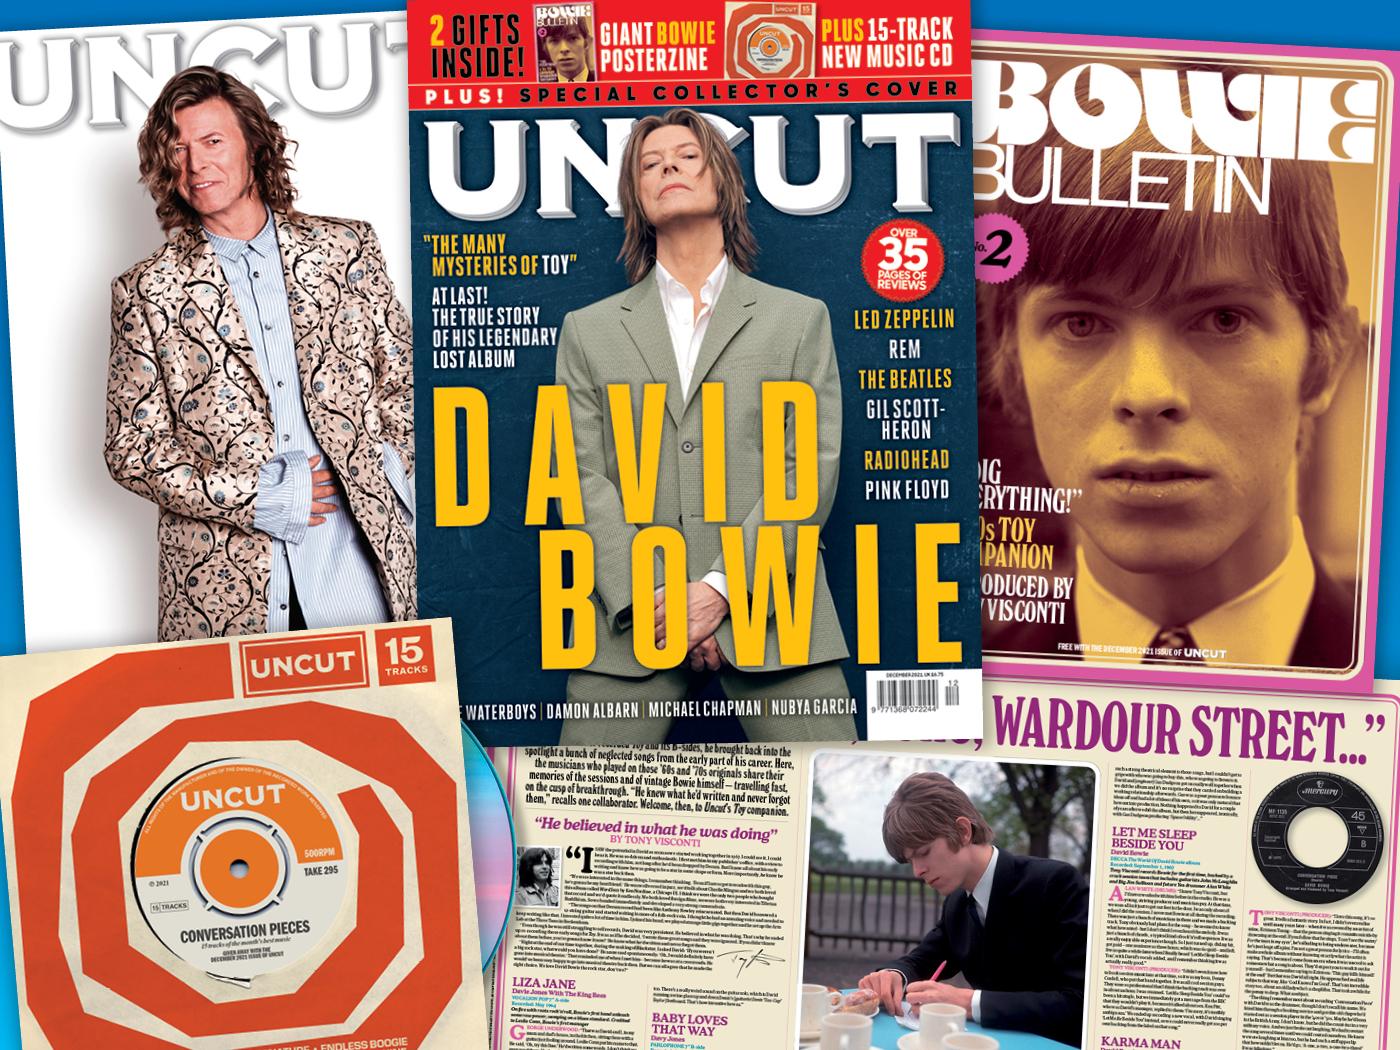 Inside Uncut's new free posterzine, Bowie Bulletin No. 2